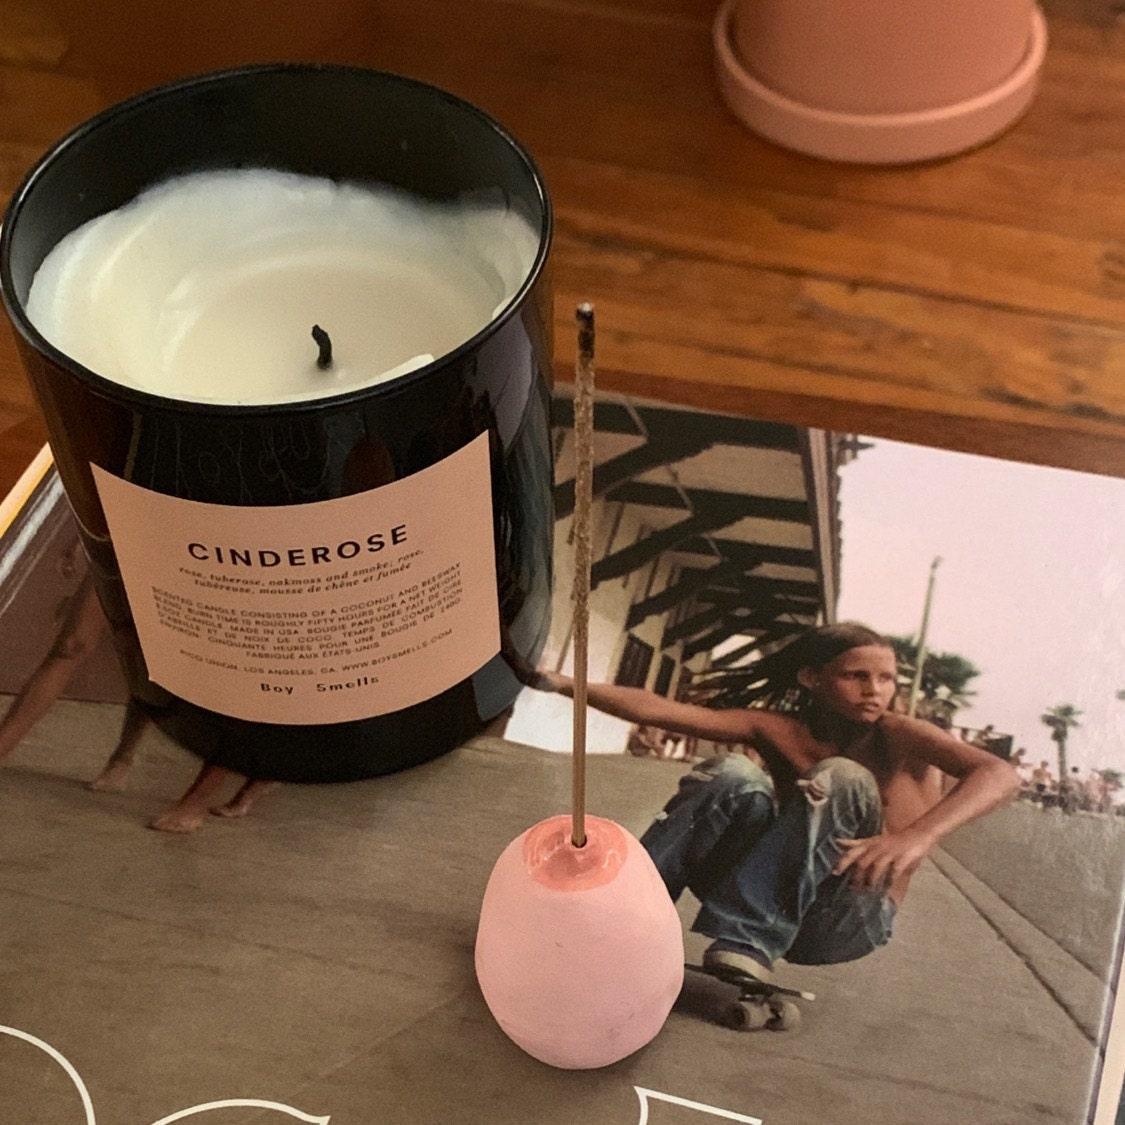 carlotarub added a photo of their purchase